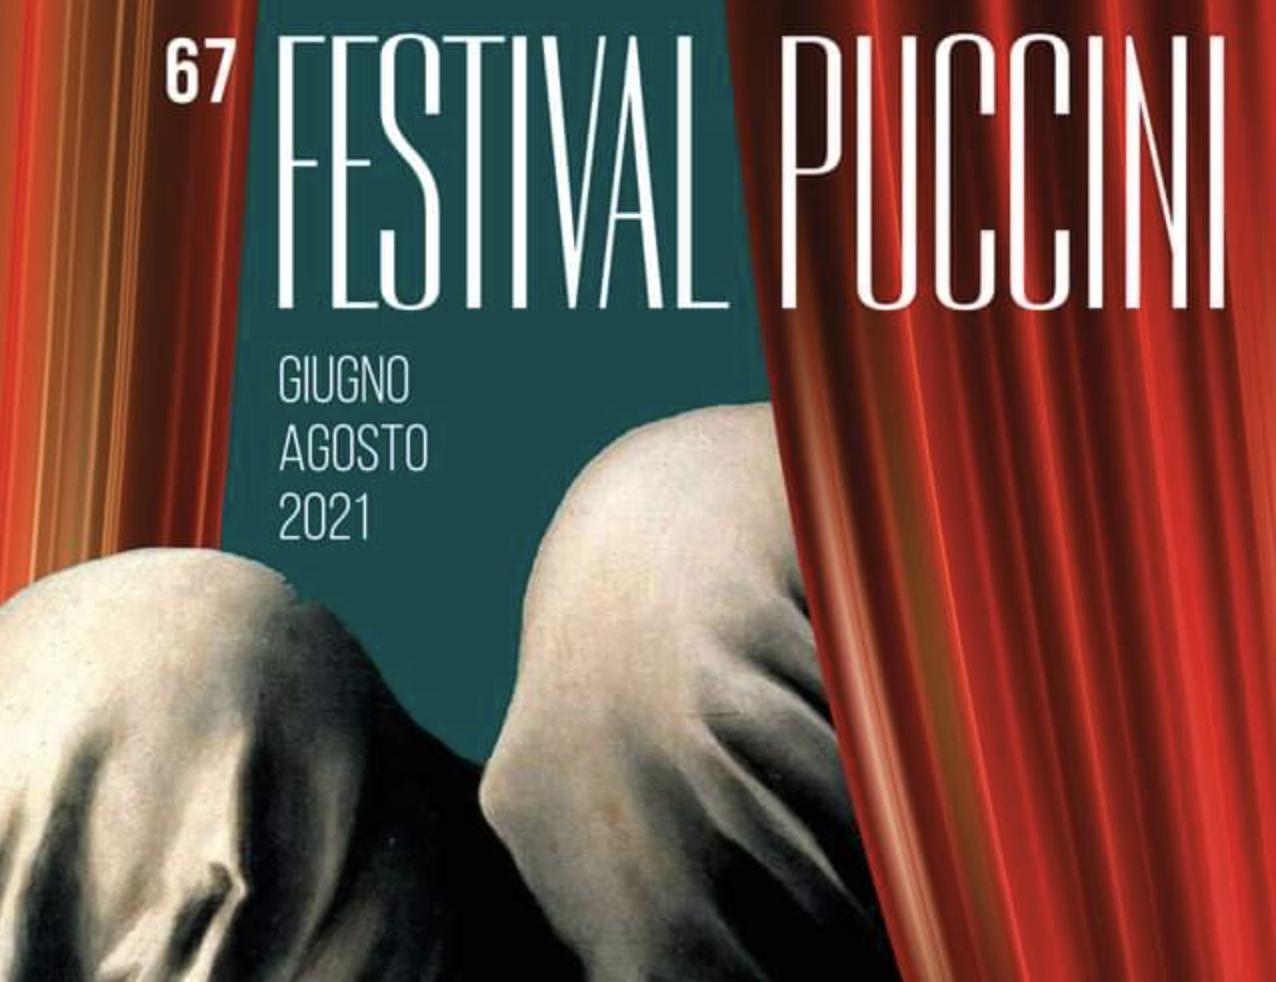 festival-puccini-torre-lago